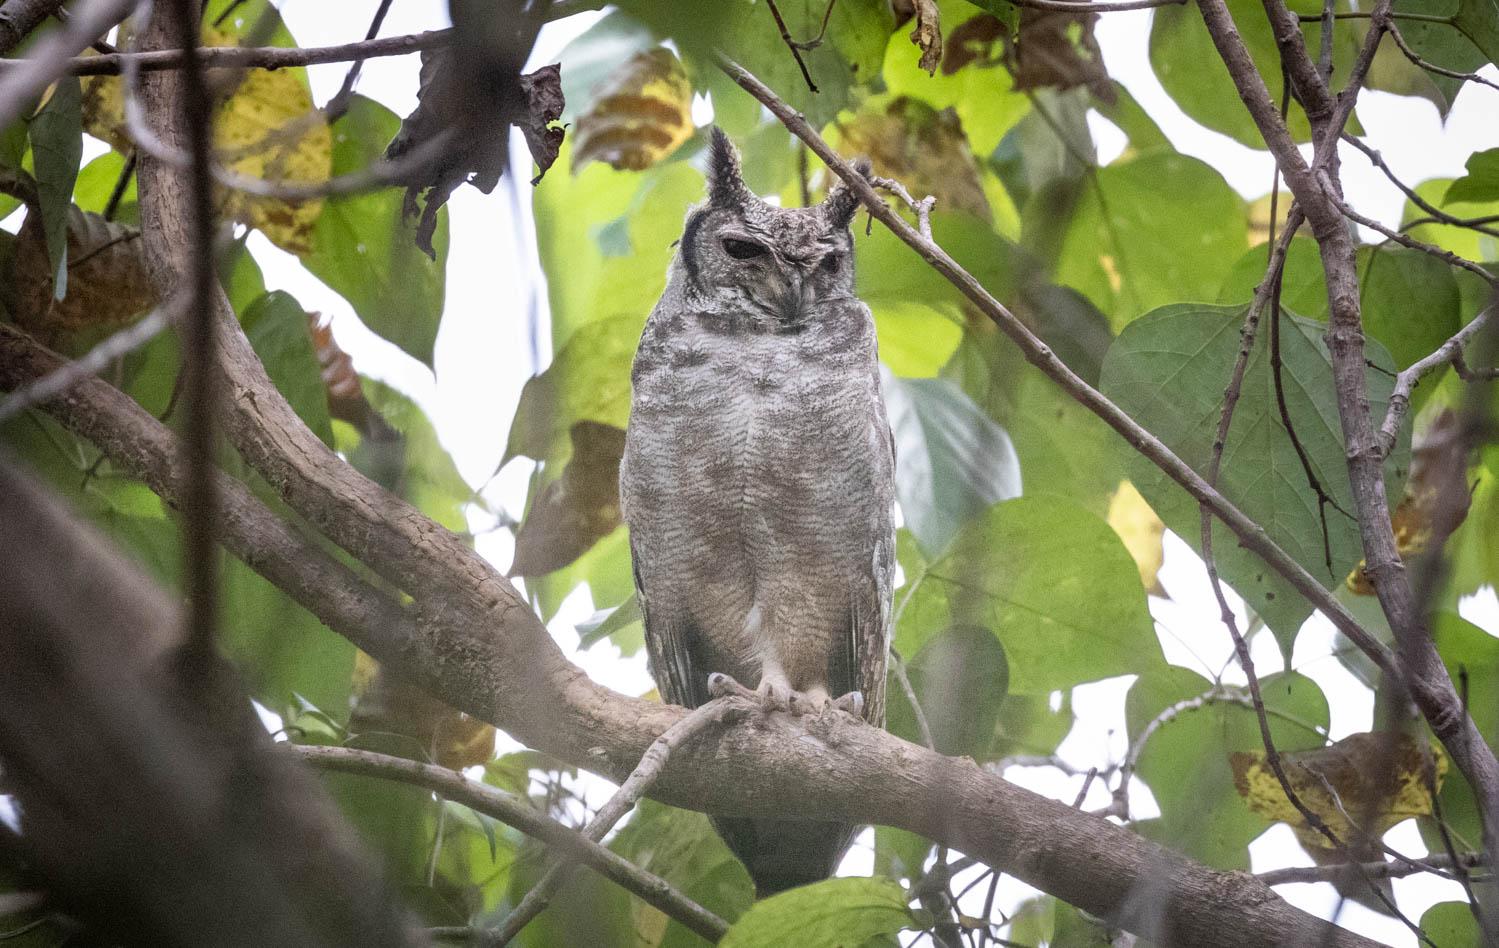 Greyish eagle owl, Ferrakunda